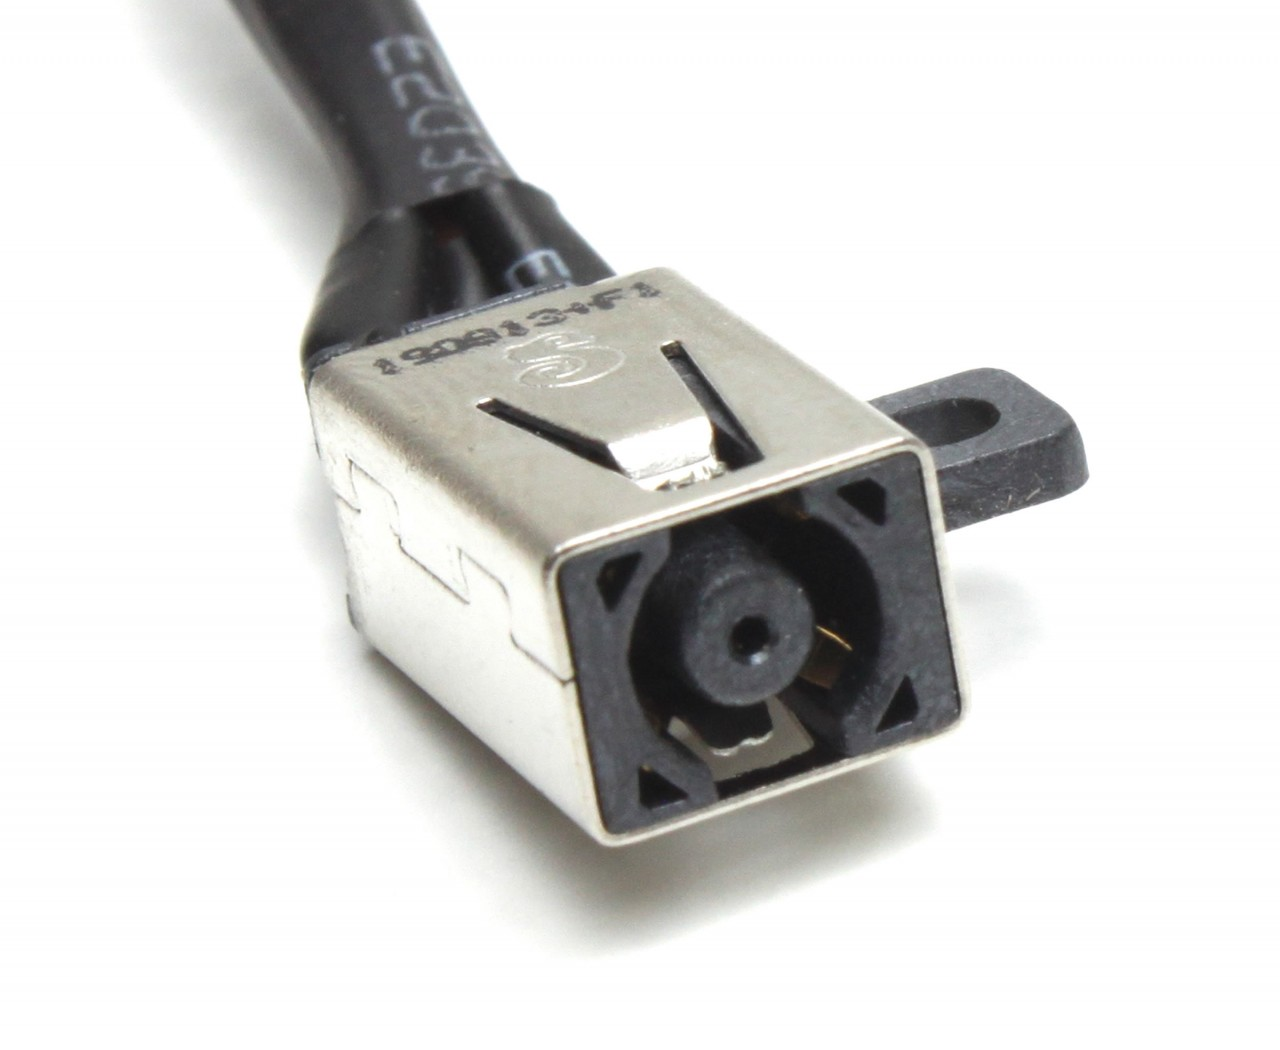 Mufa alimentare laptop Dell Inspiron 15 3576 cu fir si conector cu 6 pini 5 fire imagine powerlaptop.ro 2021